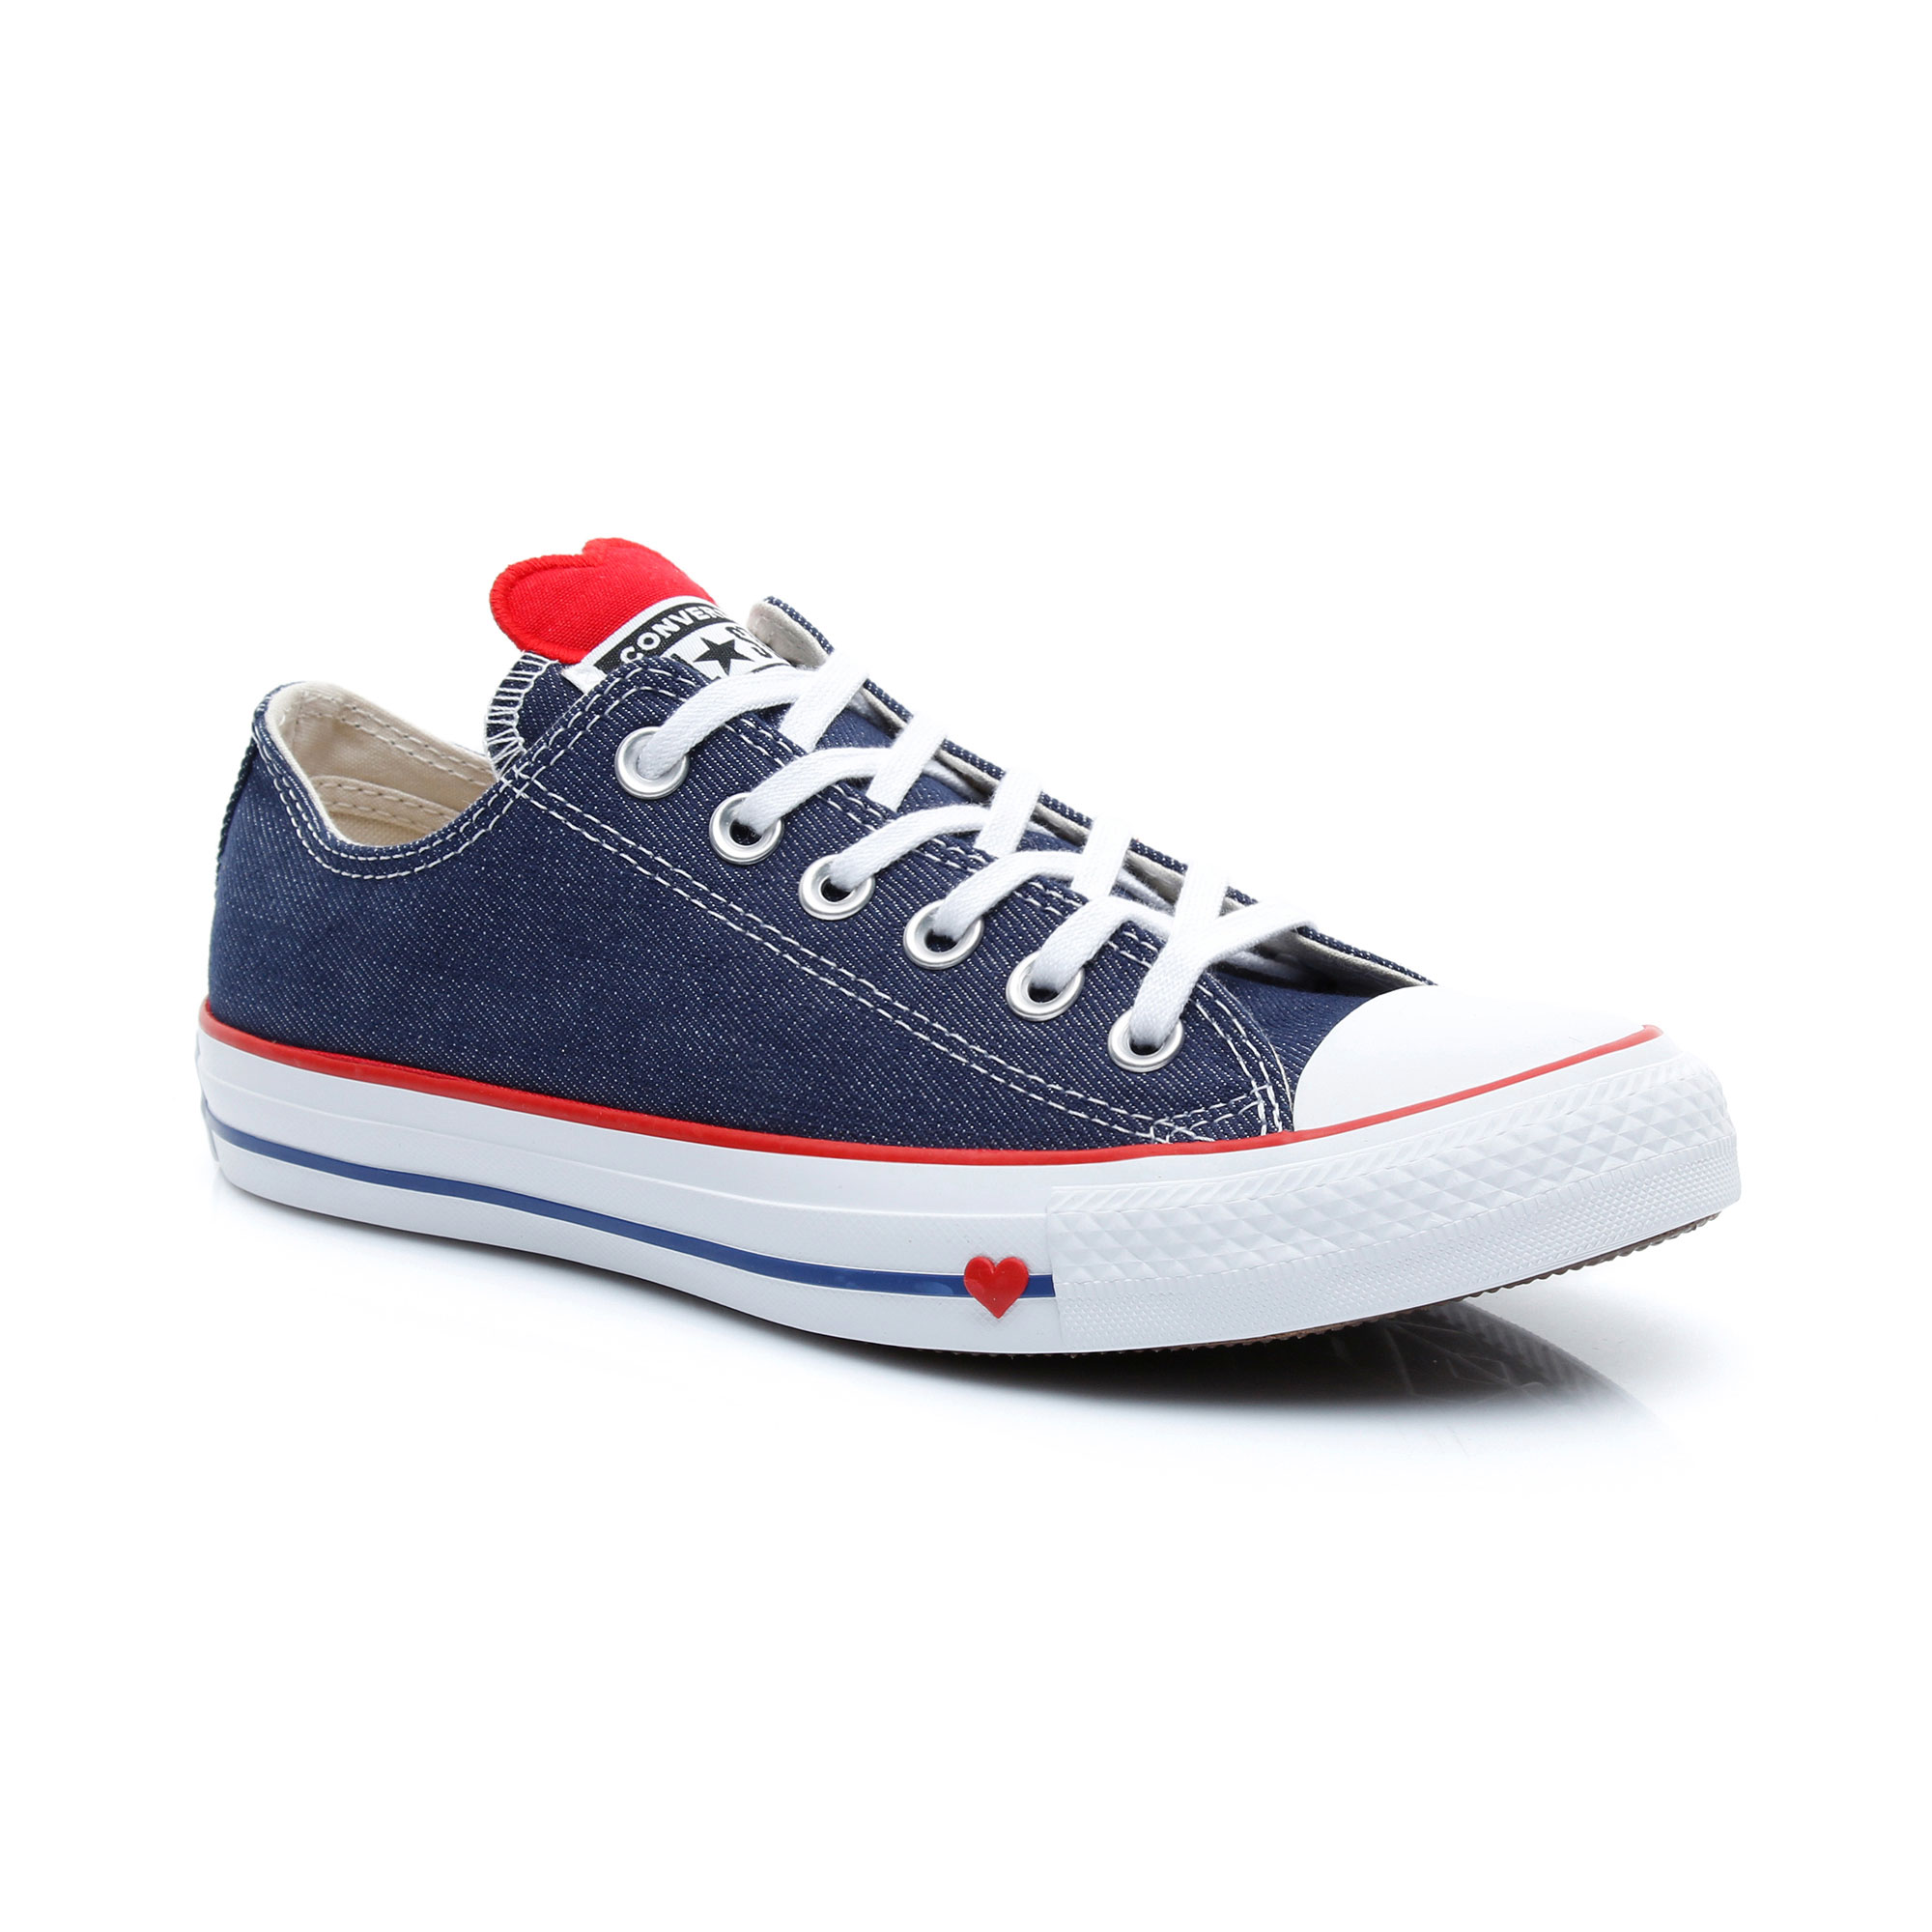 Converse Chuck Taylor All Star Denim Love Kadın Lacivert Sneaker